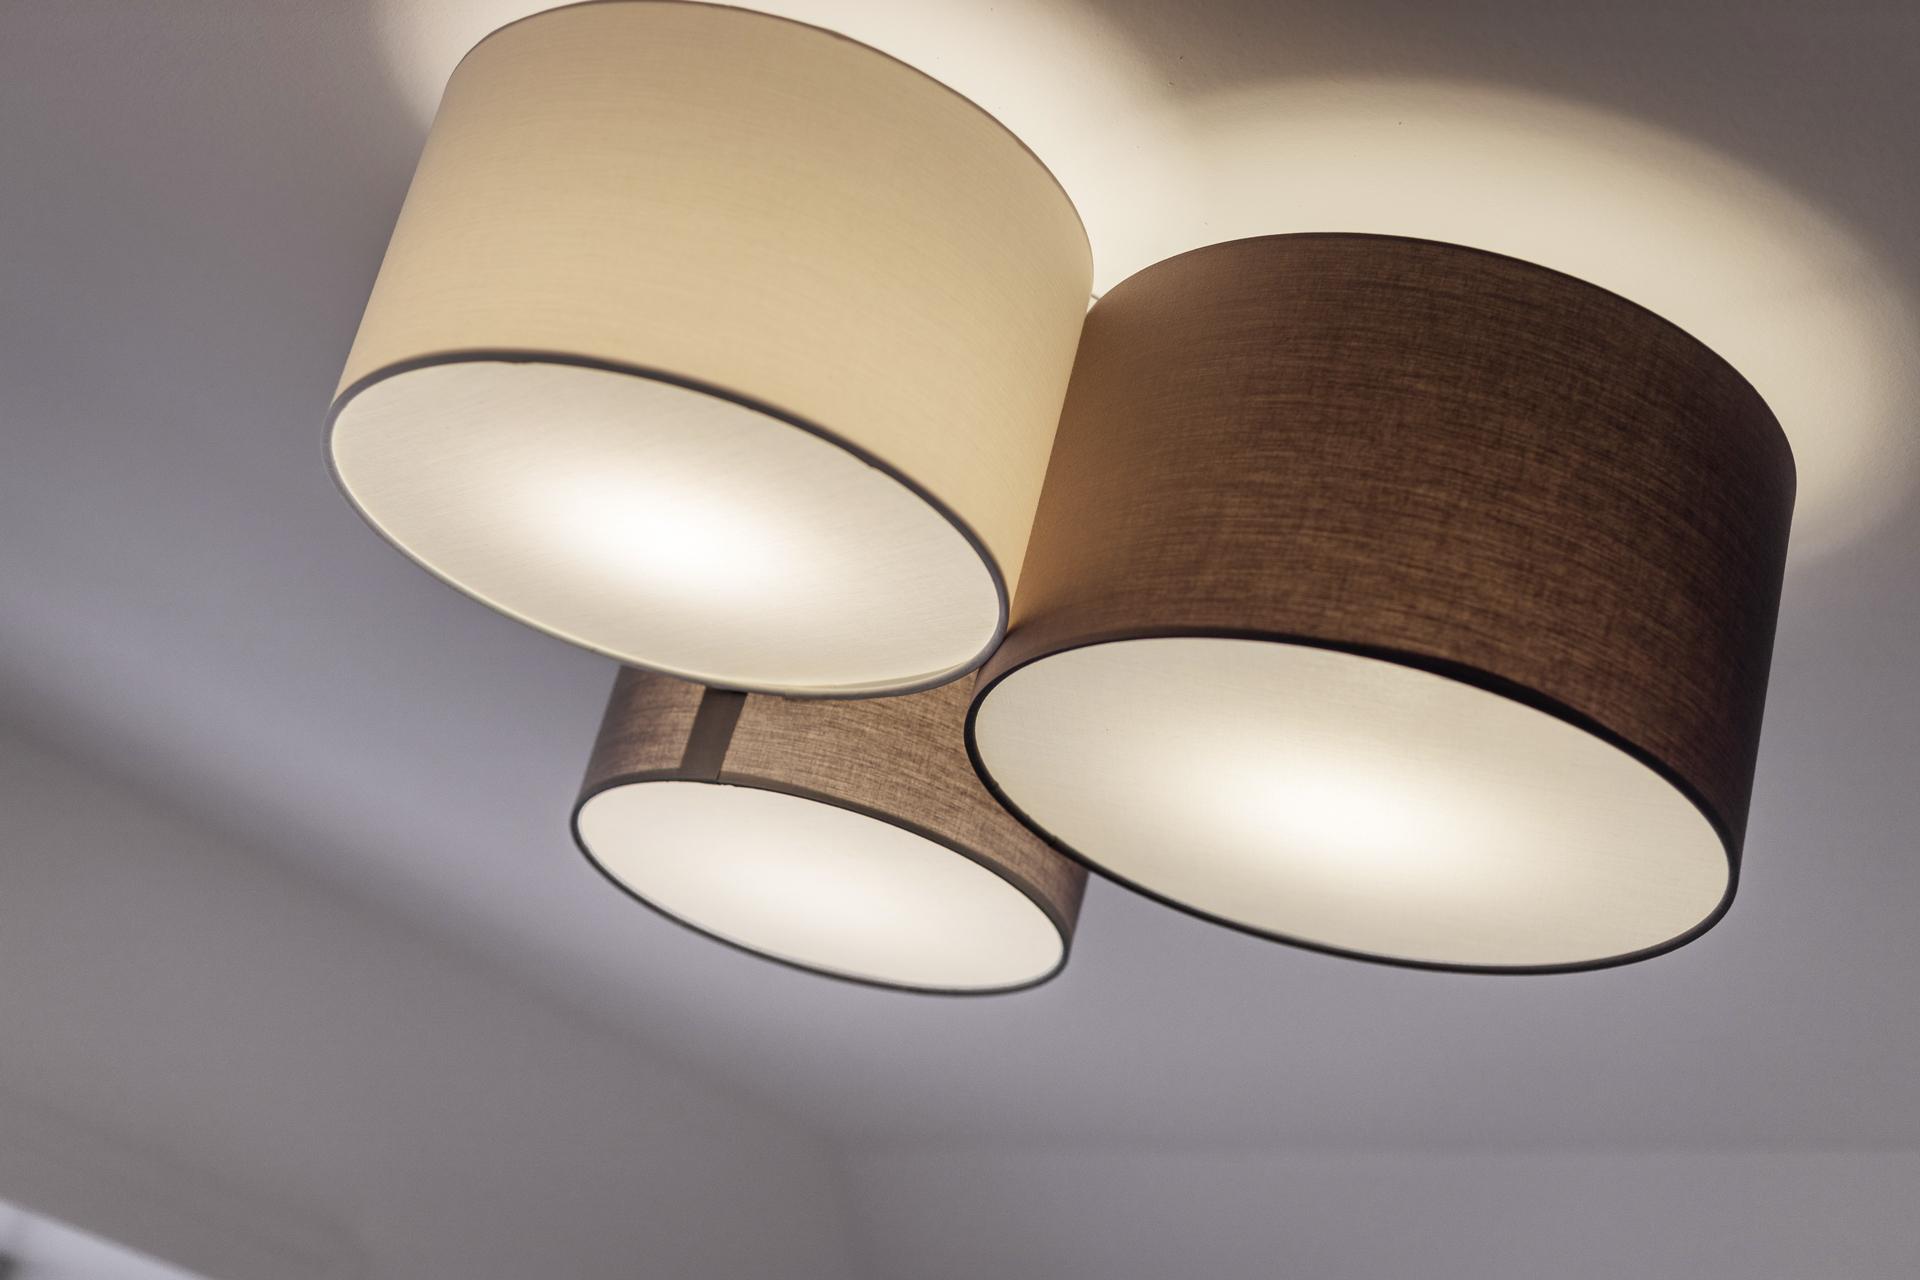 Decken-lampe_1